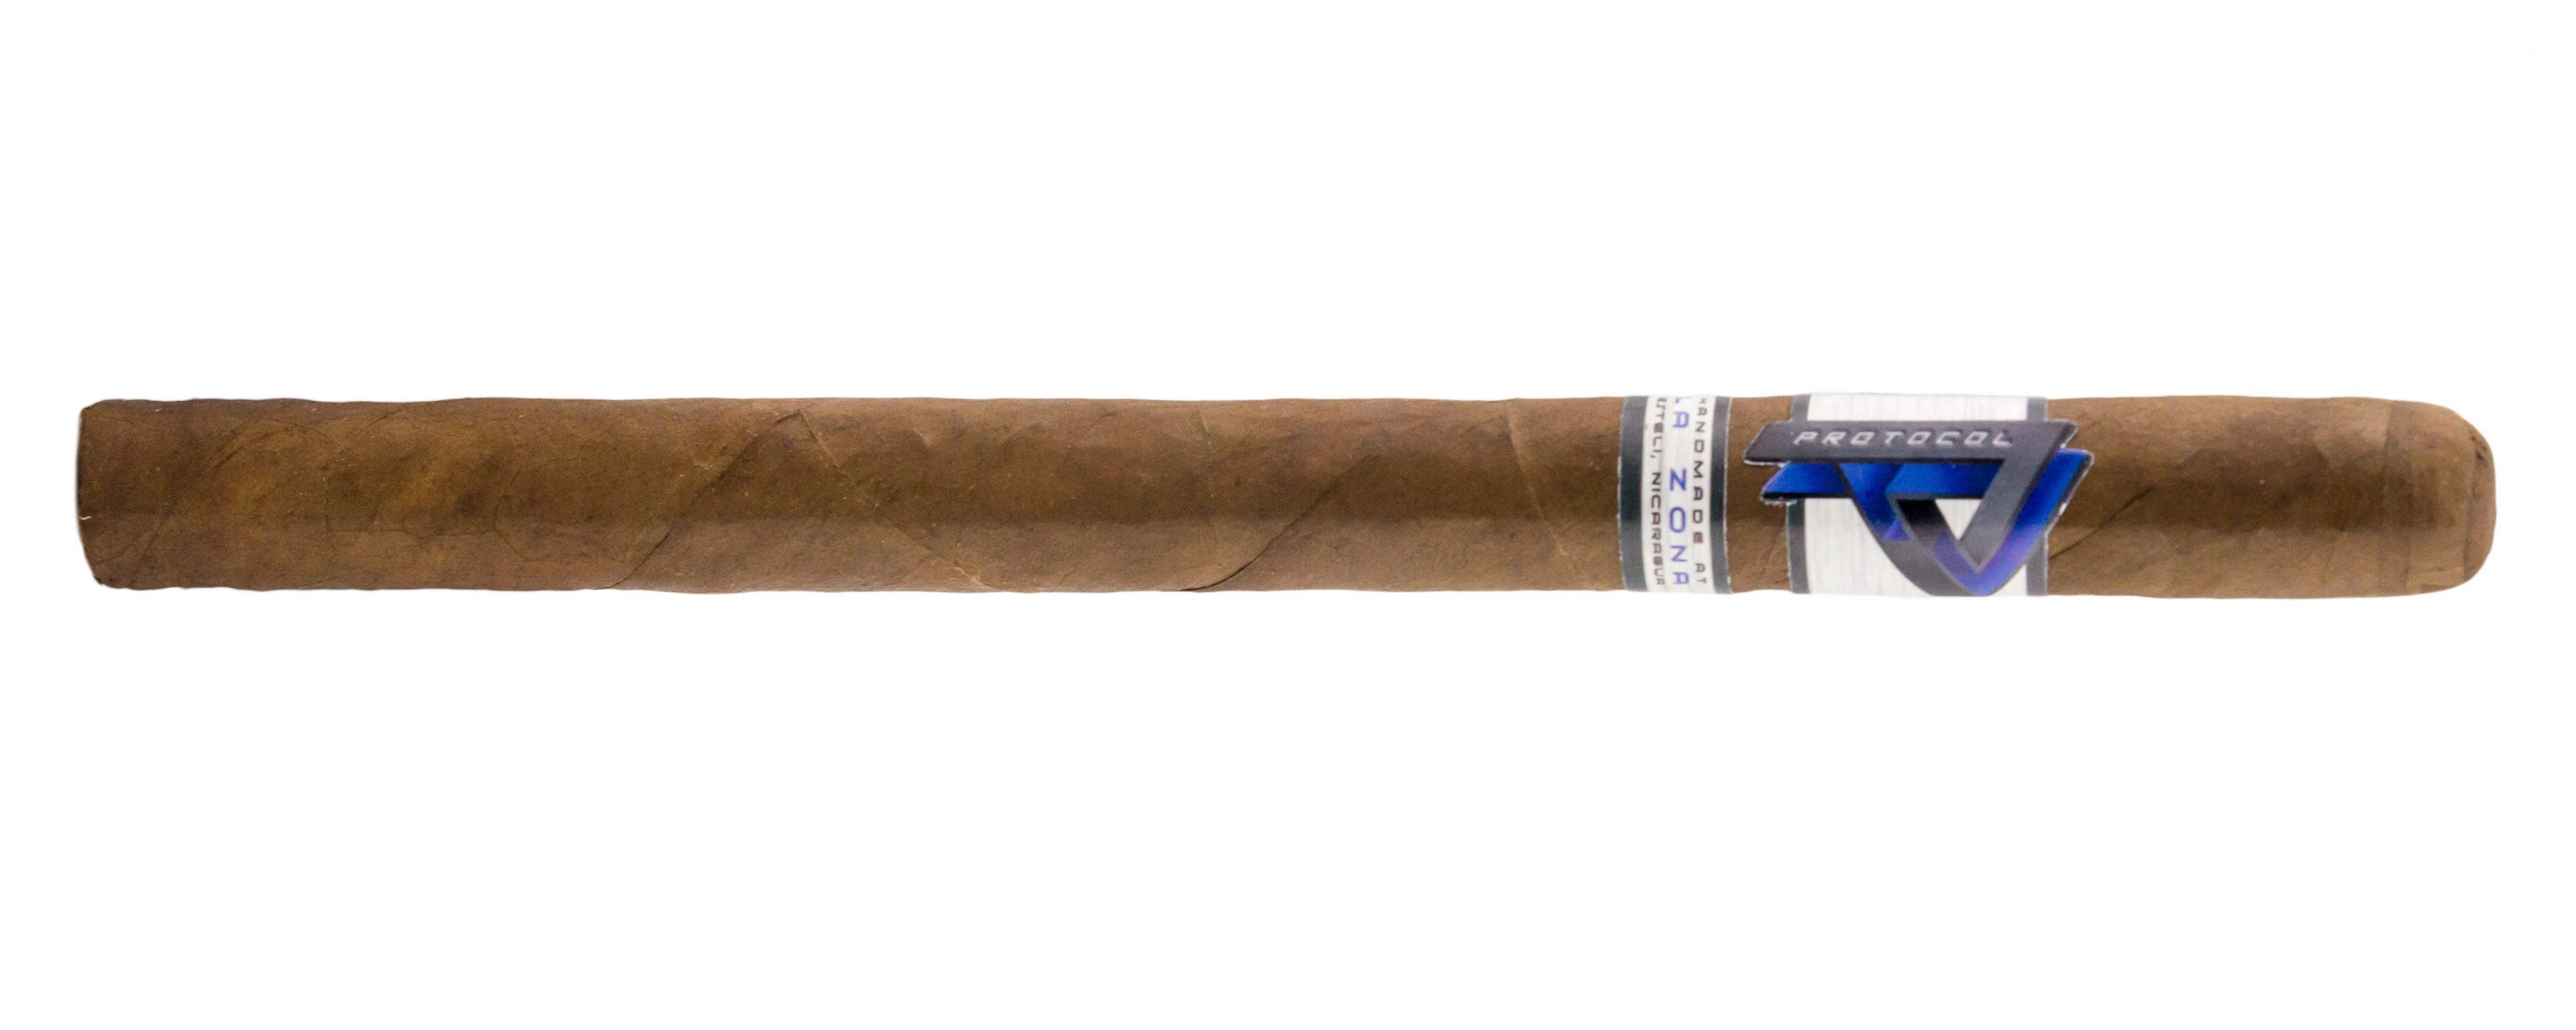 Blind Cigar Review: Cubariqueño | Protocol Lancero